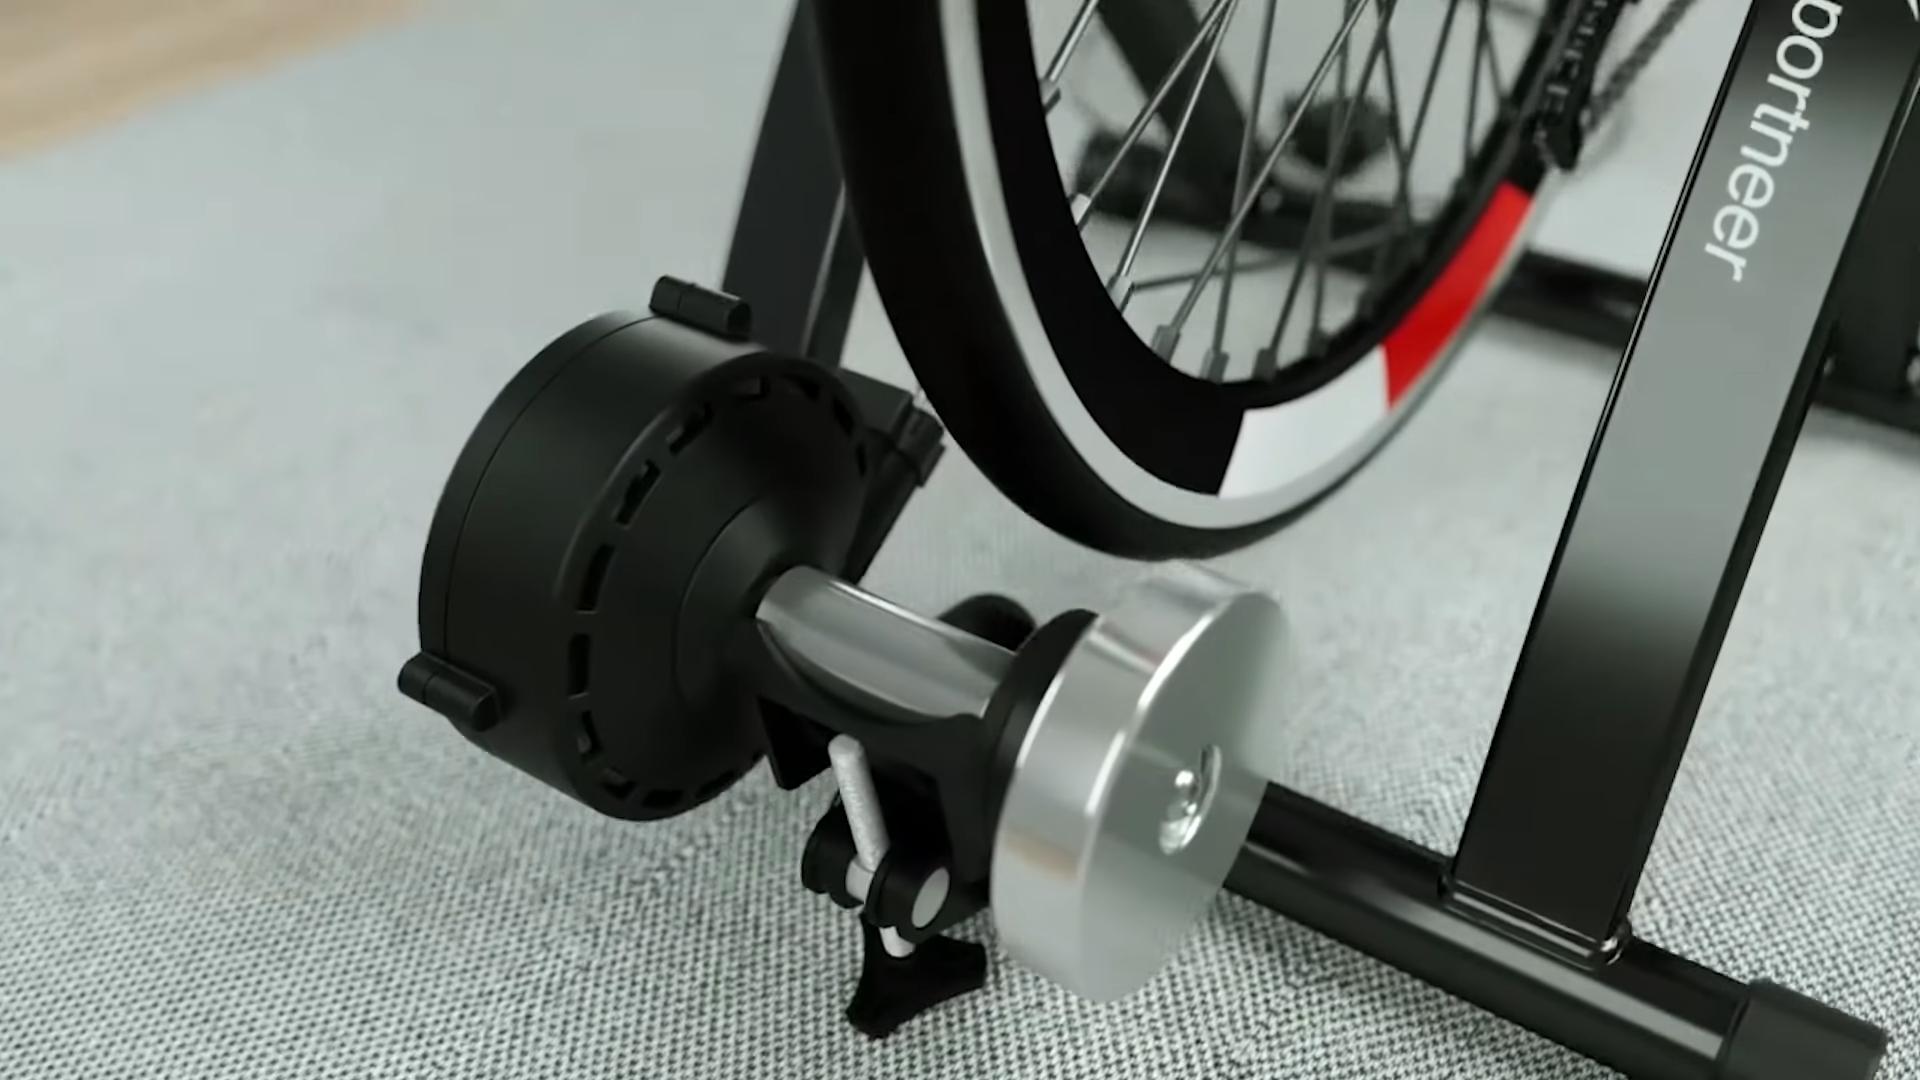 Livestrong Recumbent Bike Craigslist Sf Bikes Foldable Bike